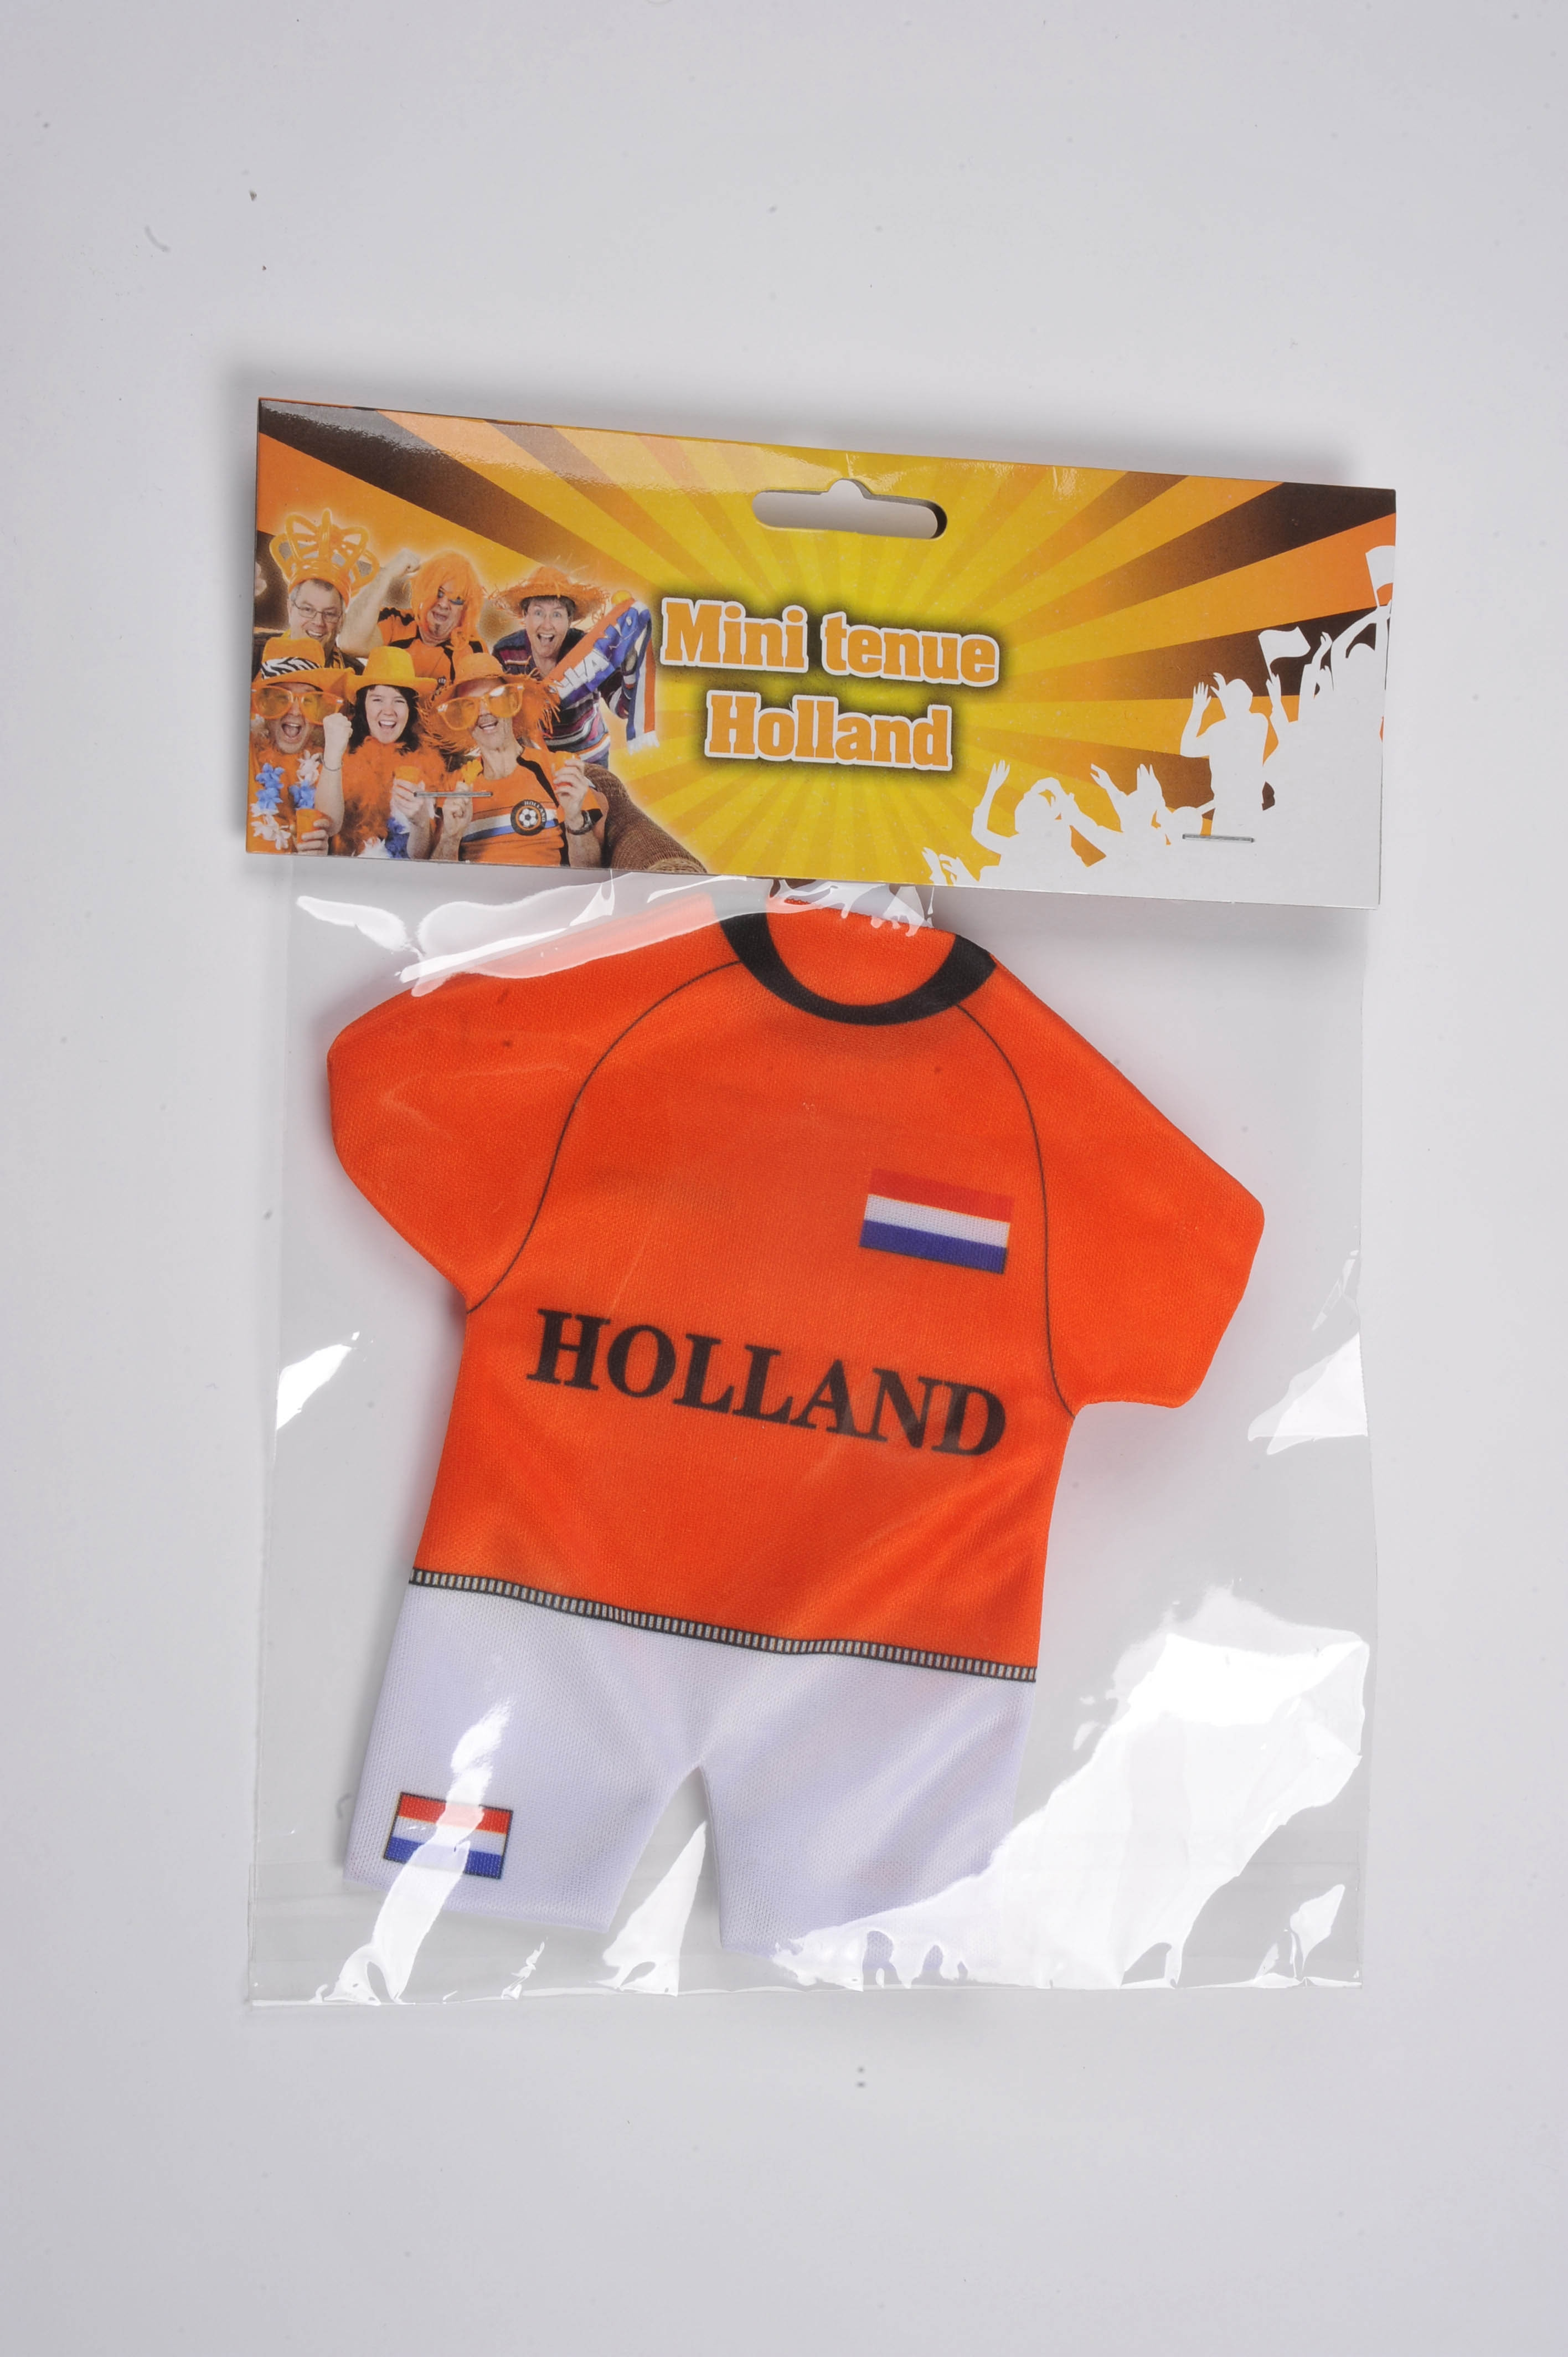 Autohanger Oranje tenue holland